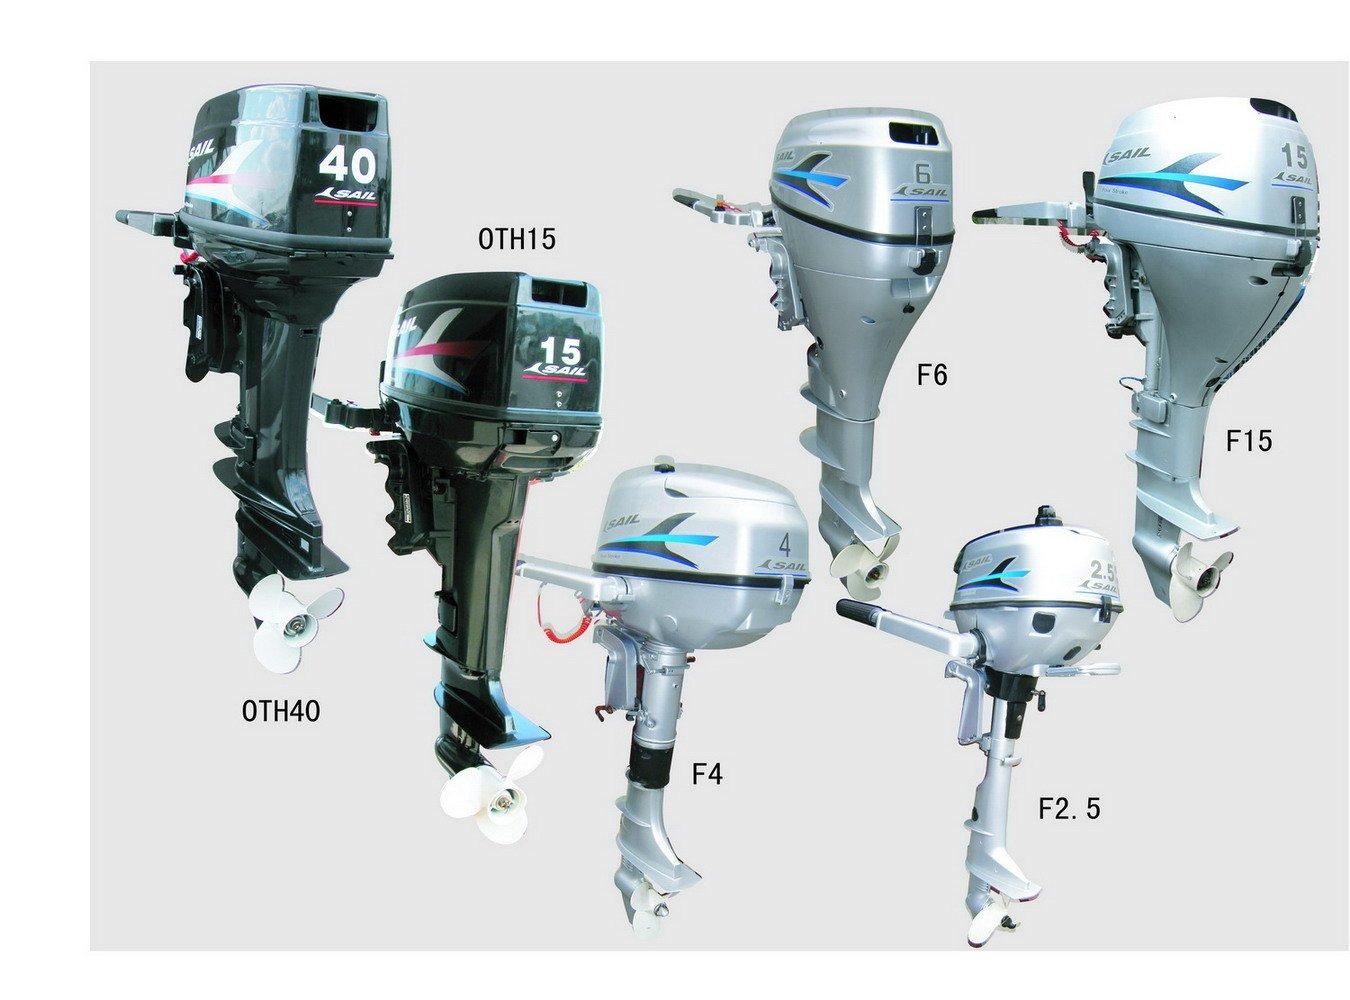 Outboard motor series 4 stroke 6hp 8hp 9 9hp 15hp for Buy boat motors online